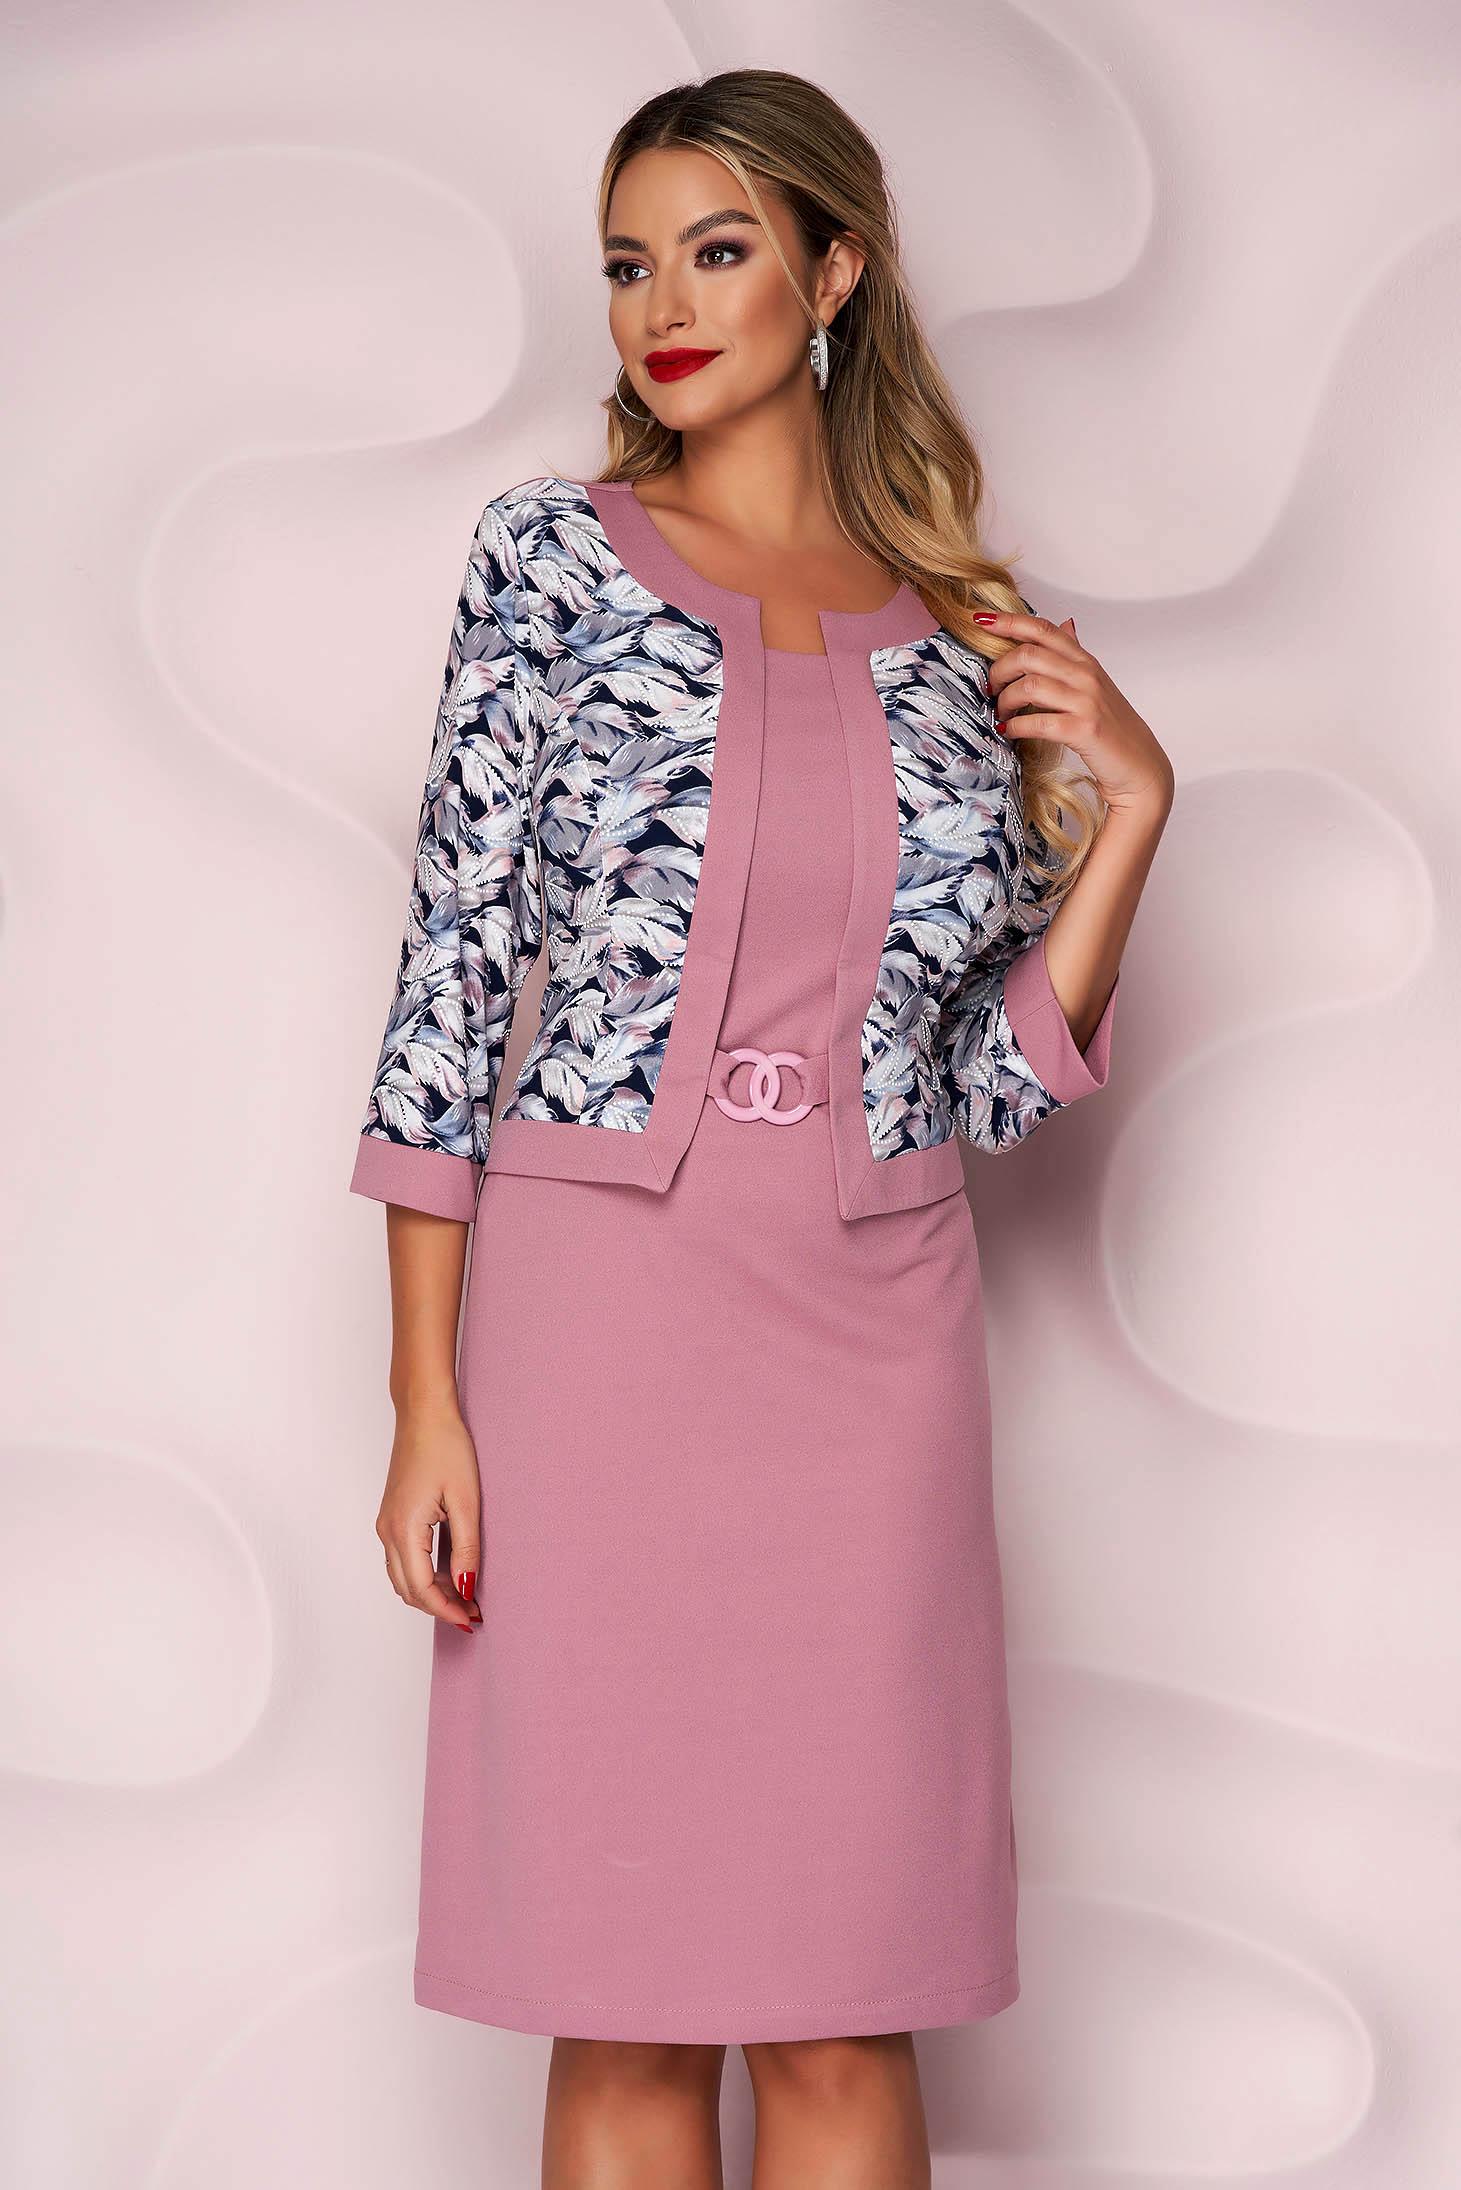 Pink dress pencil slightly elastic fabric elegant midi accessorized with belt